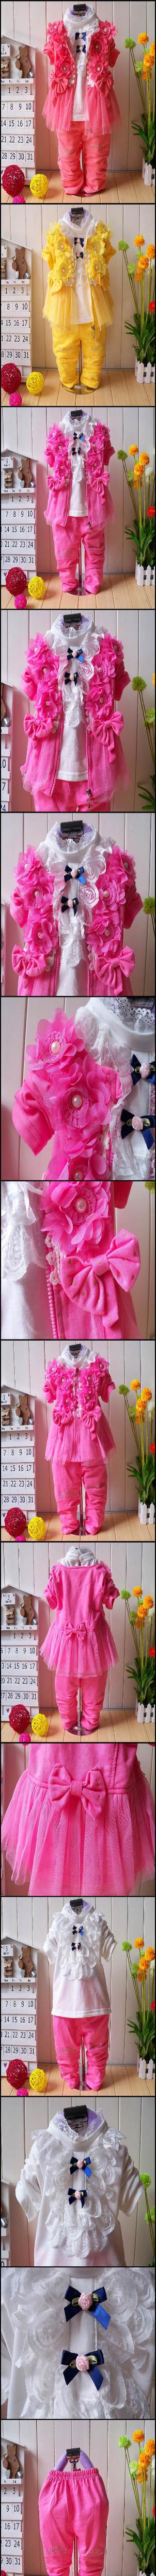 Скидки на 3 Pcs Brand New Baby Girl Dress Summer Style Girl Lace Dress 2015 Fashion Kids Clothes Long Sleeve Girl Dress Top+Pant+Vest